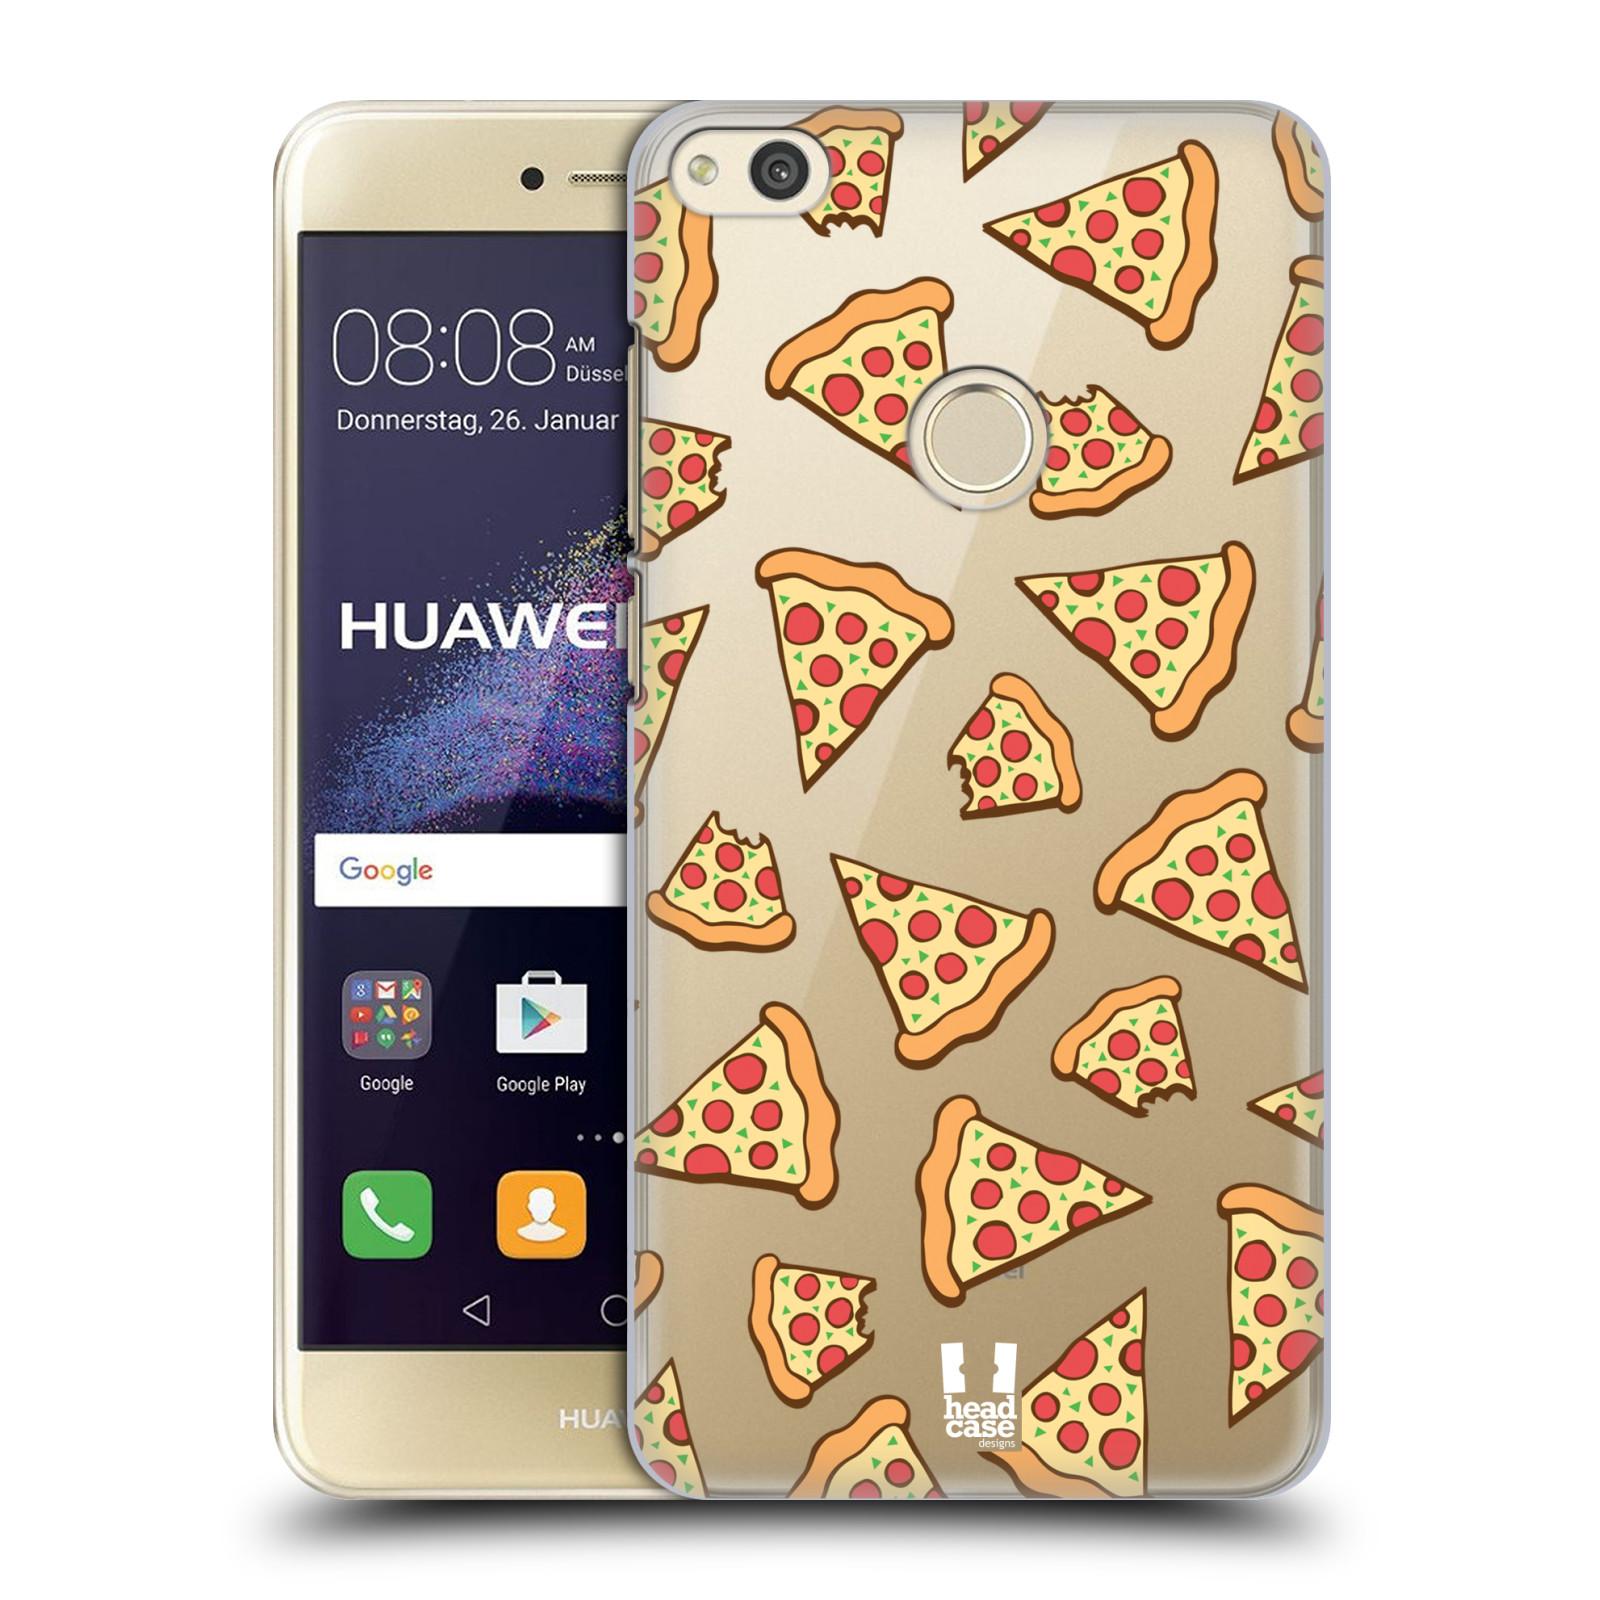 Plastové pouzdro na mobil Huawei P9 Lite (2017) - Head Case - Pizza (Plastový kryt či obal na mobilní telefon s motivem Pizza pro Huawei P9 Lite (2017) (Dual SIM))